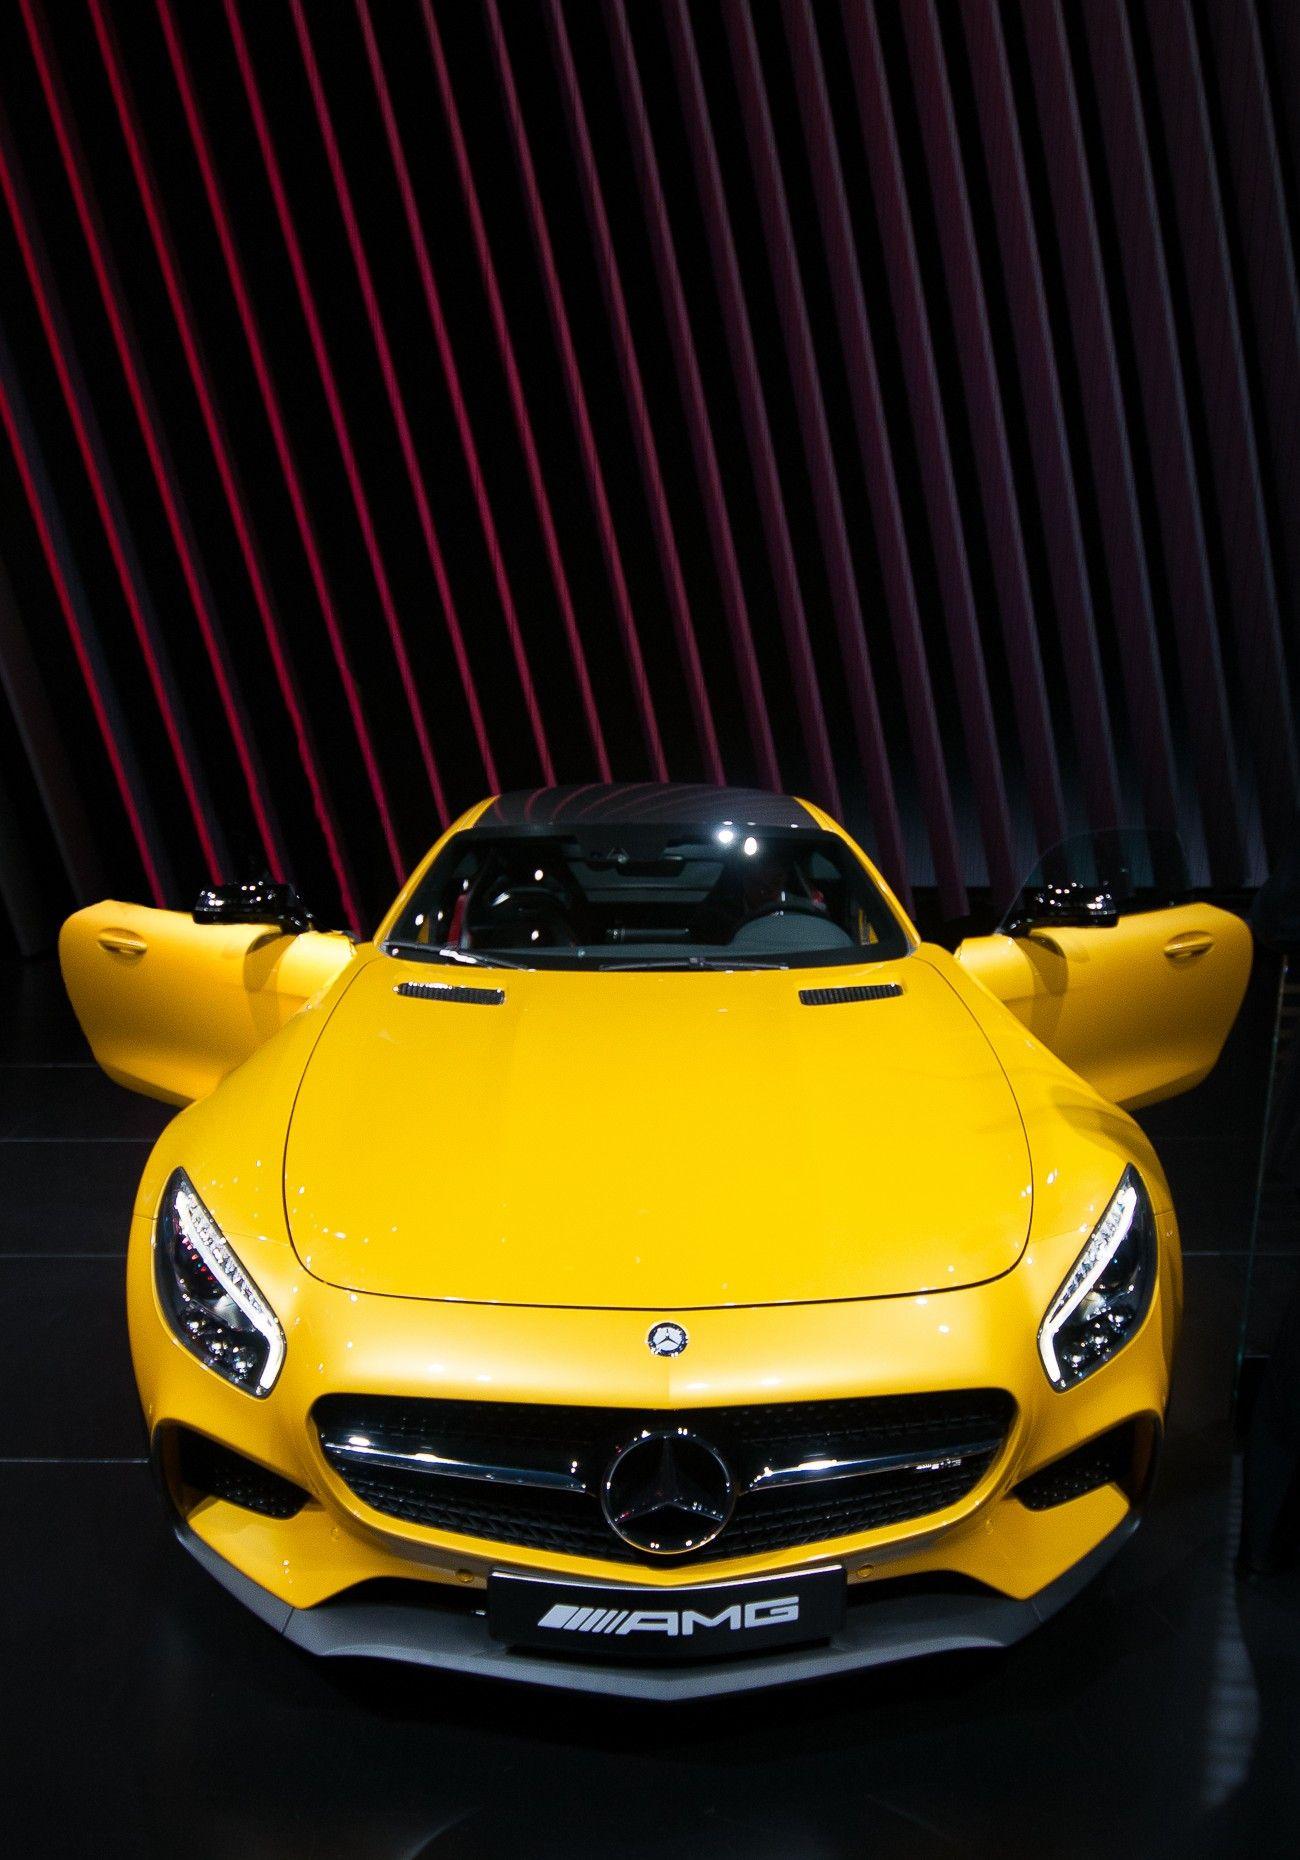 Mercedes-Benz AMG GT Coupé - this car | CARS | Pinterest ... on